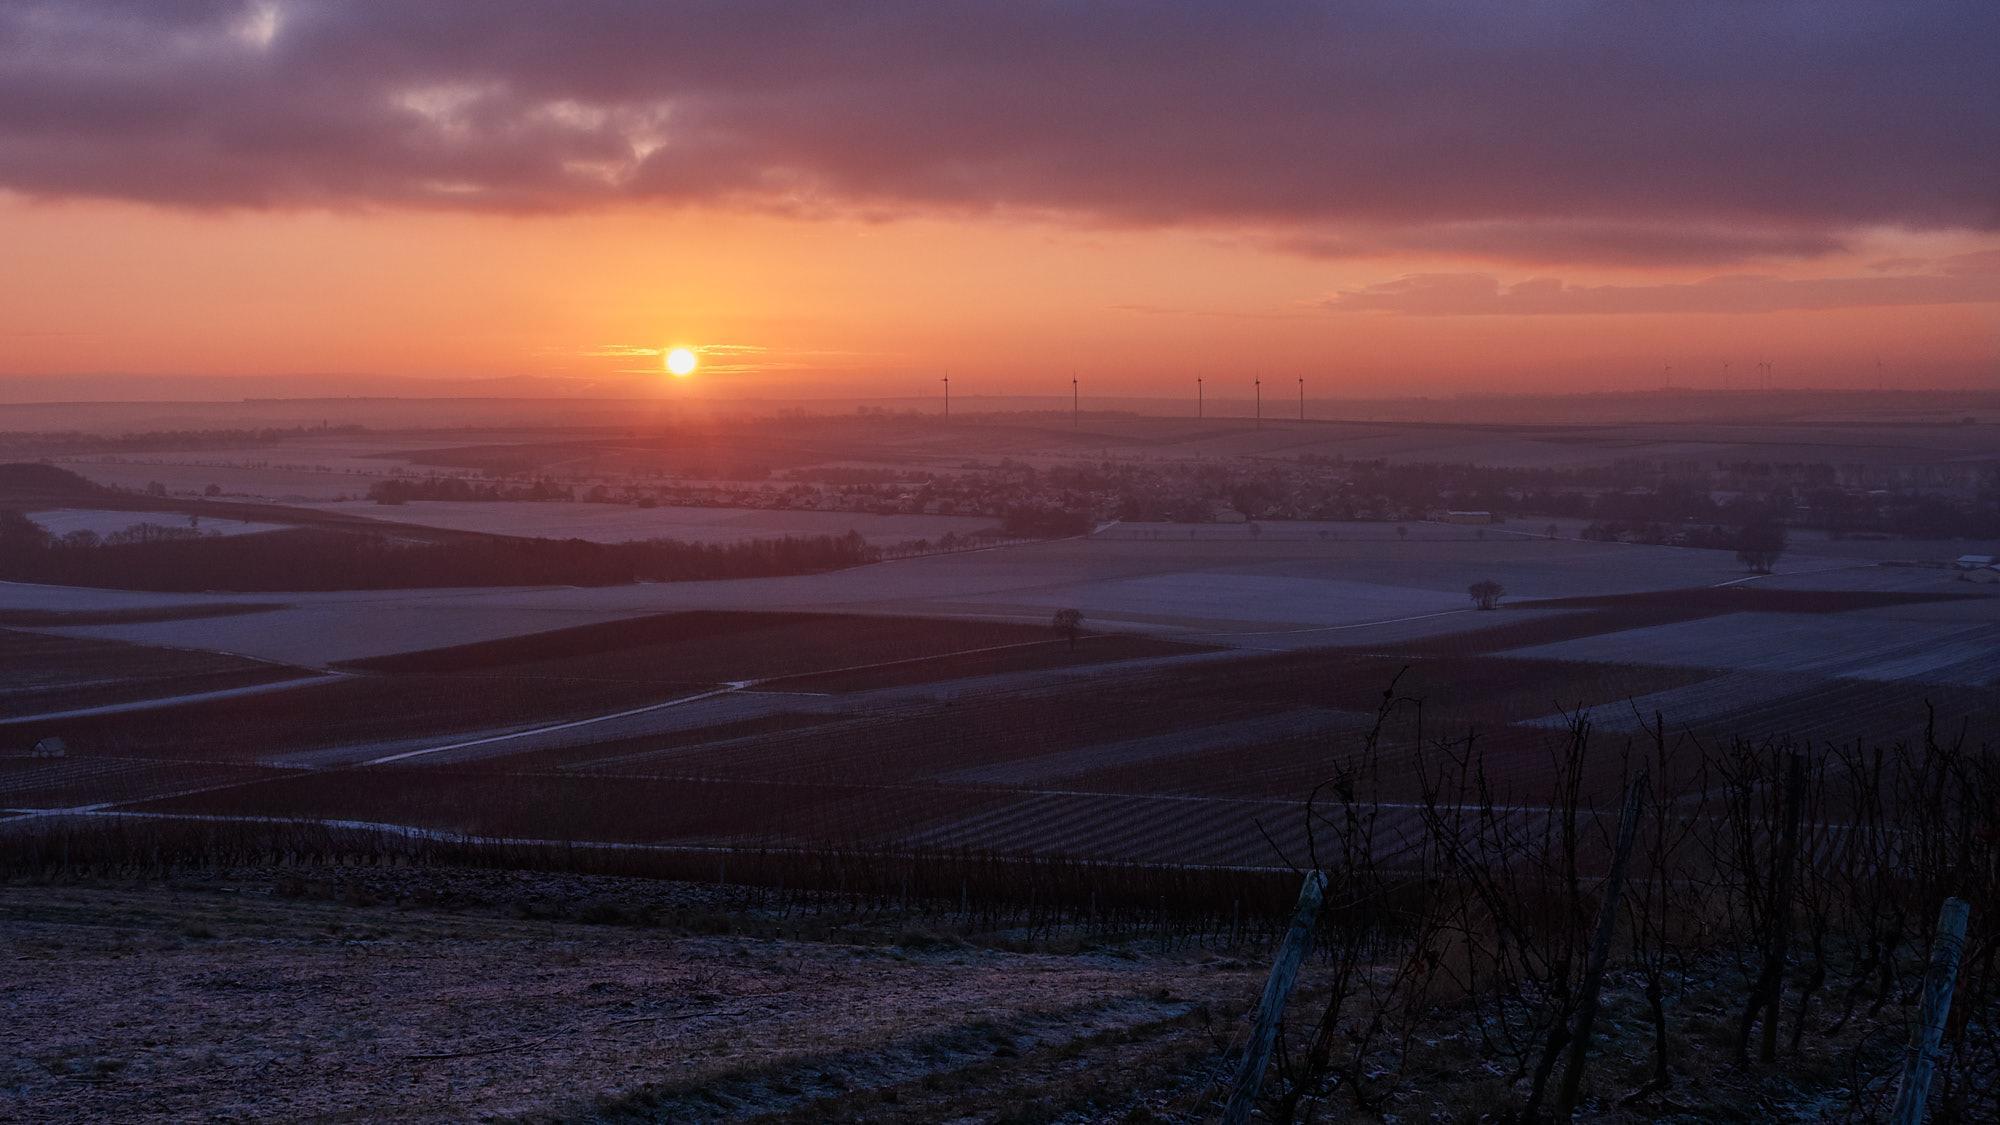 Sonnenaufgang über Rochuskapelle, Oblatenkloster St. Rupert und ...